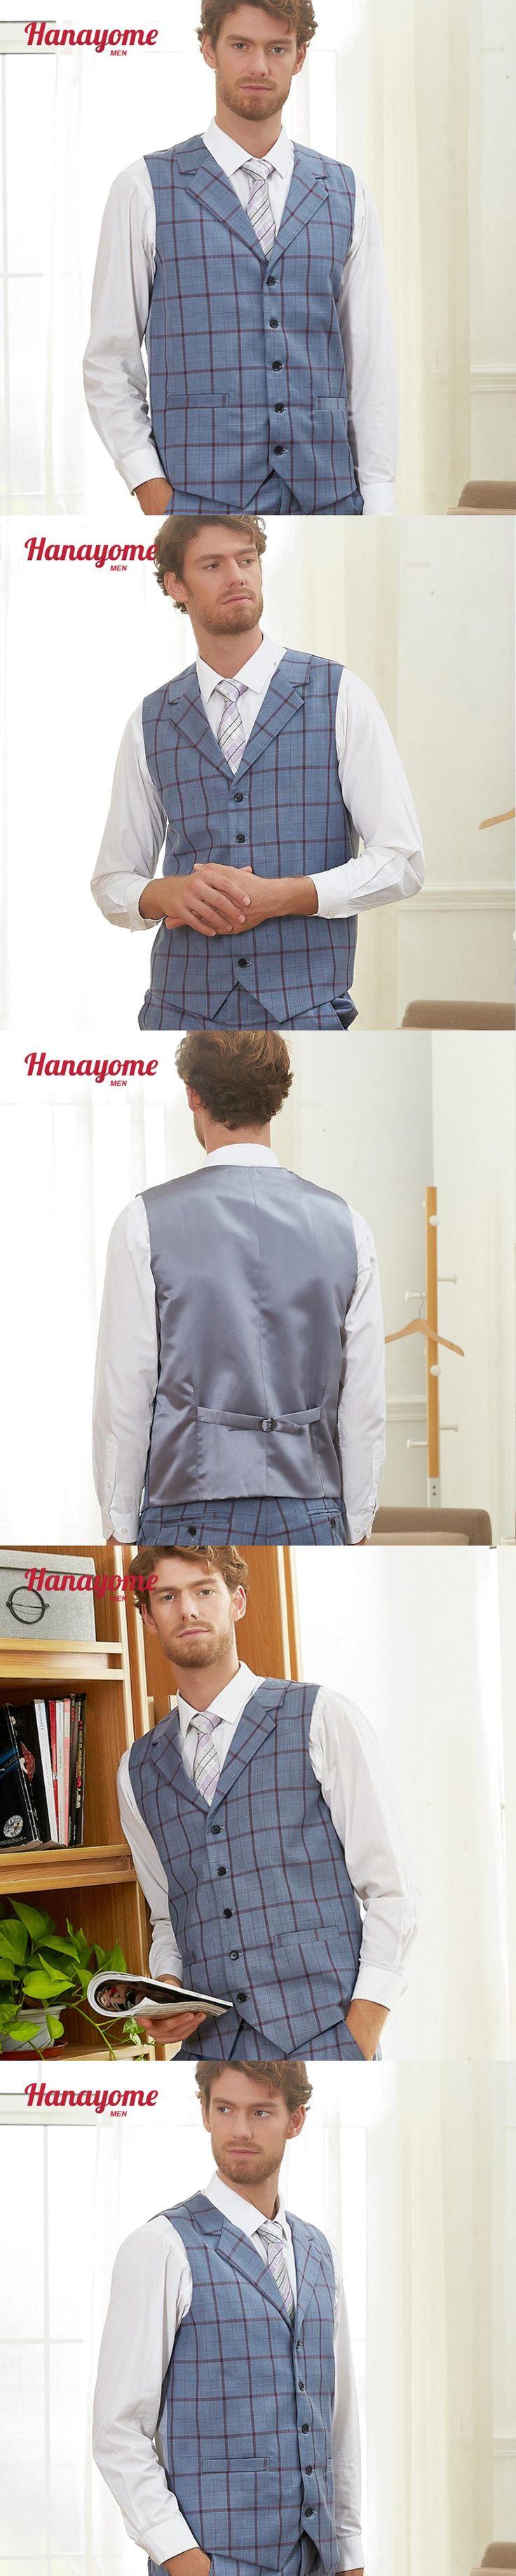 Men's Vest Fashinal Blue Checked Suit Waistcoat Single Breasted Adjustable Suit Gilet 2018 Sleeveless Blazer Waistcoats SI125